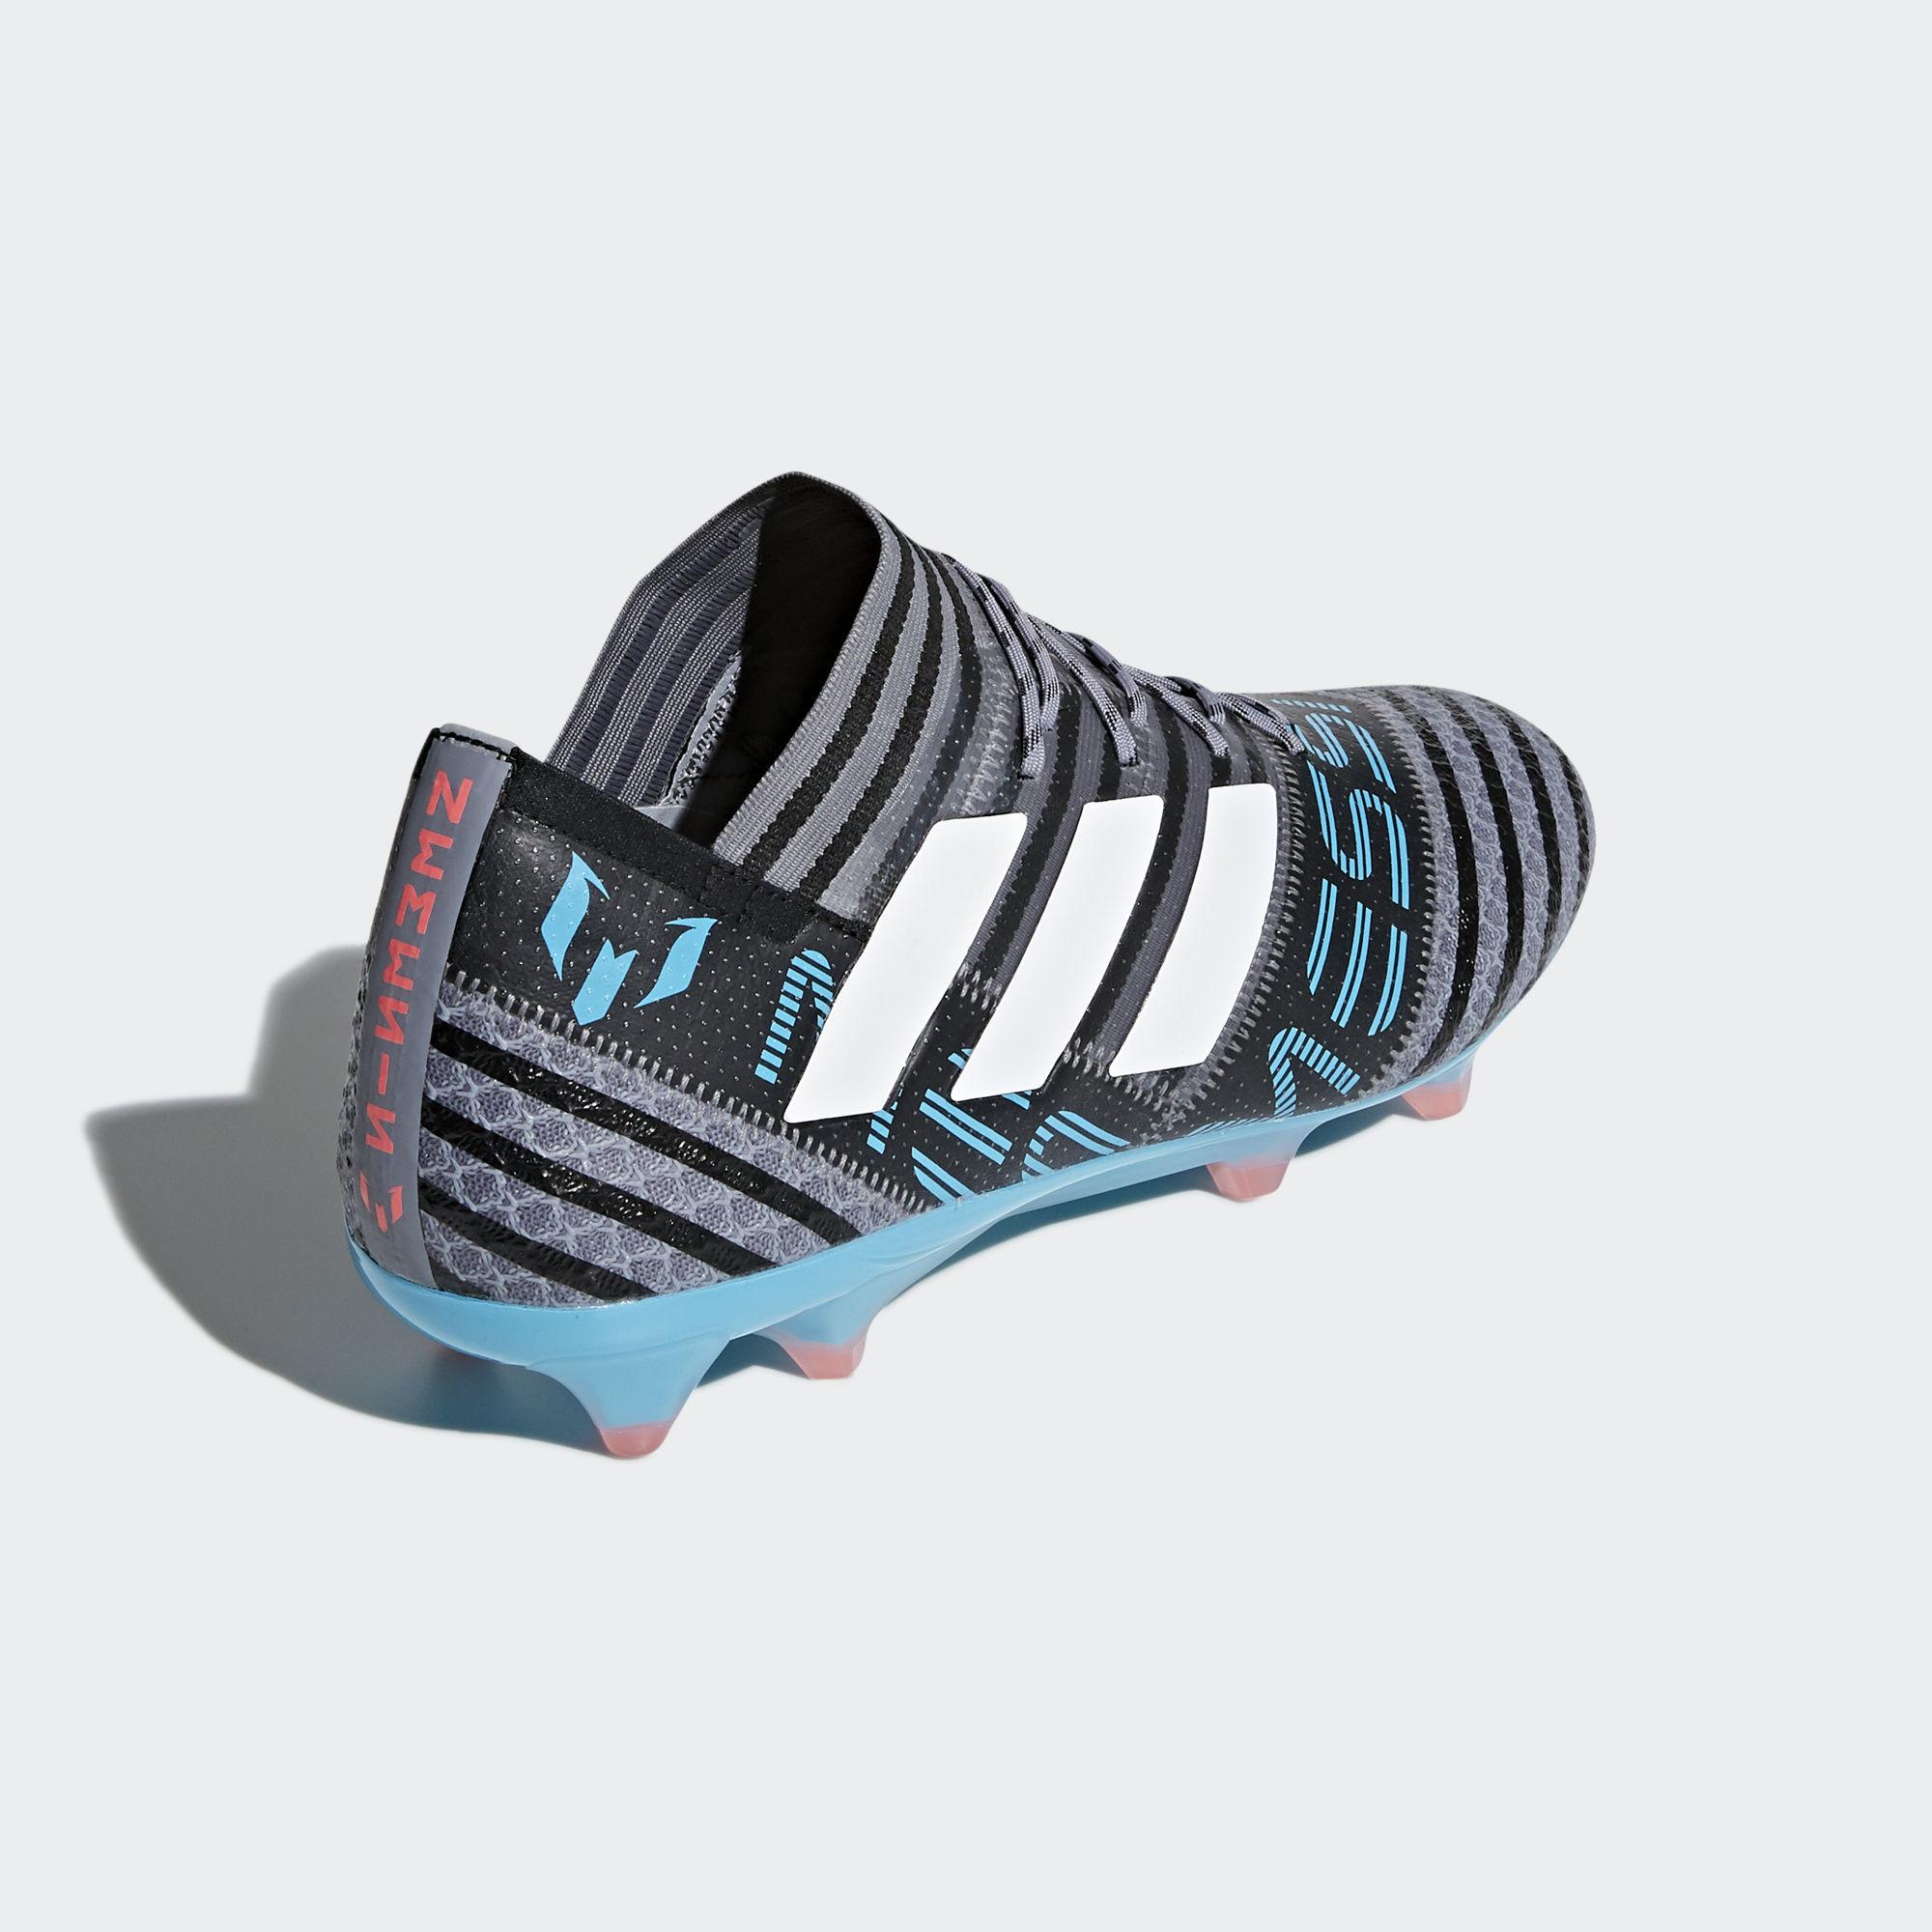 0dffd7bca ... Click to enlarge image  adidas nemeziz messi 17 1 fg cold blooded grey ftwr white core black e.jpg  ...